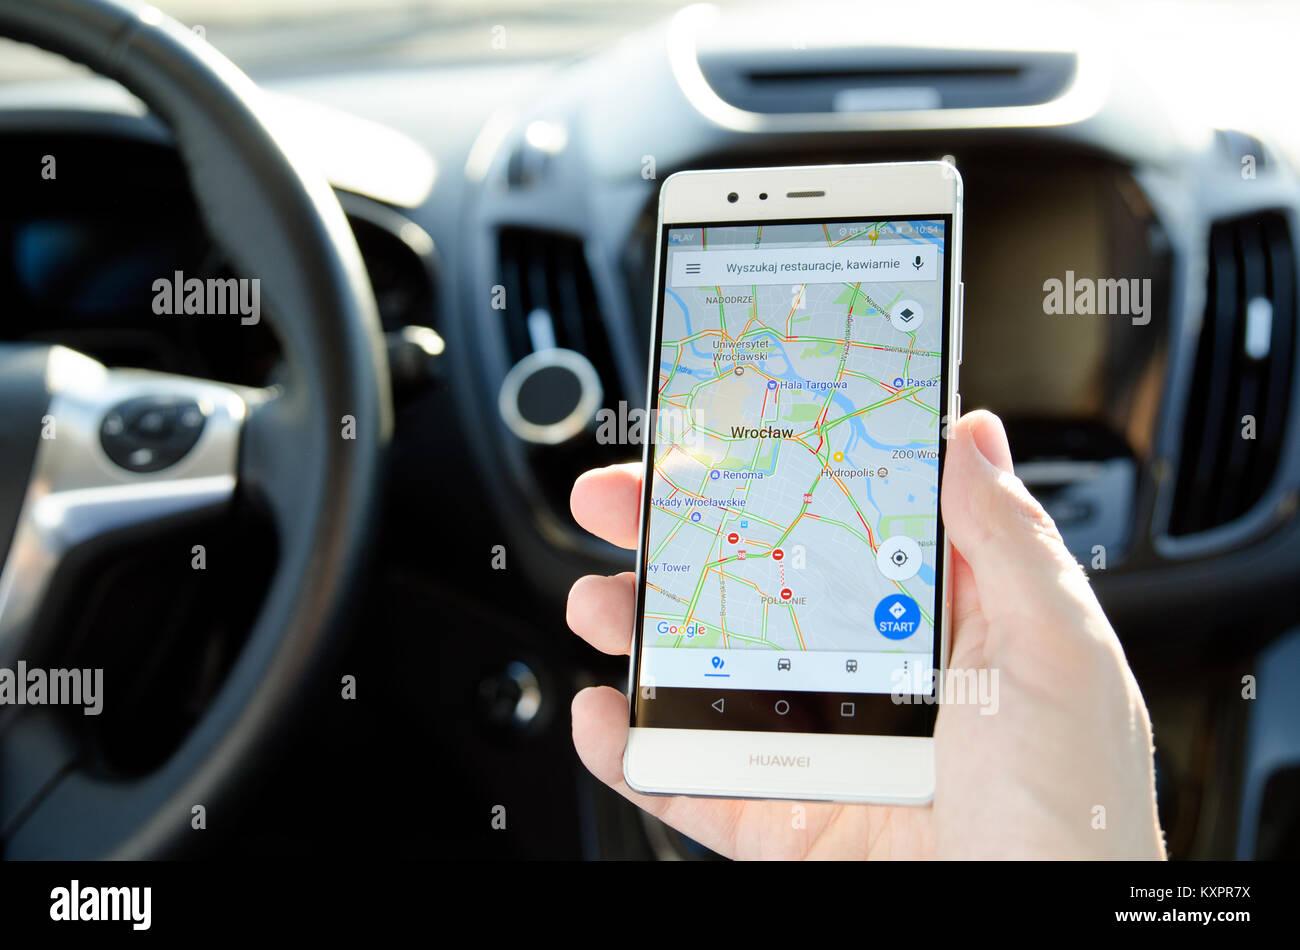 Google Maps And Car Stock Photos & Google Maps And Car Stock